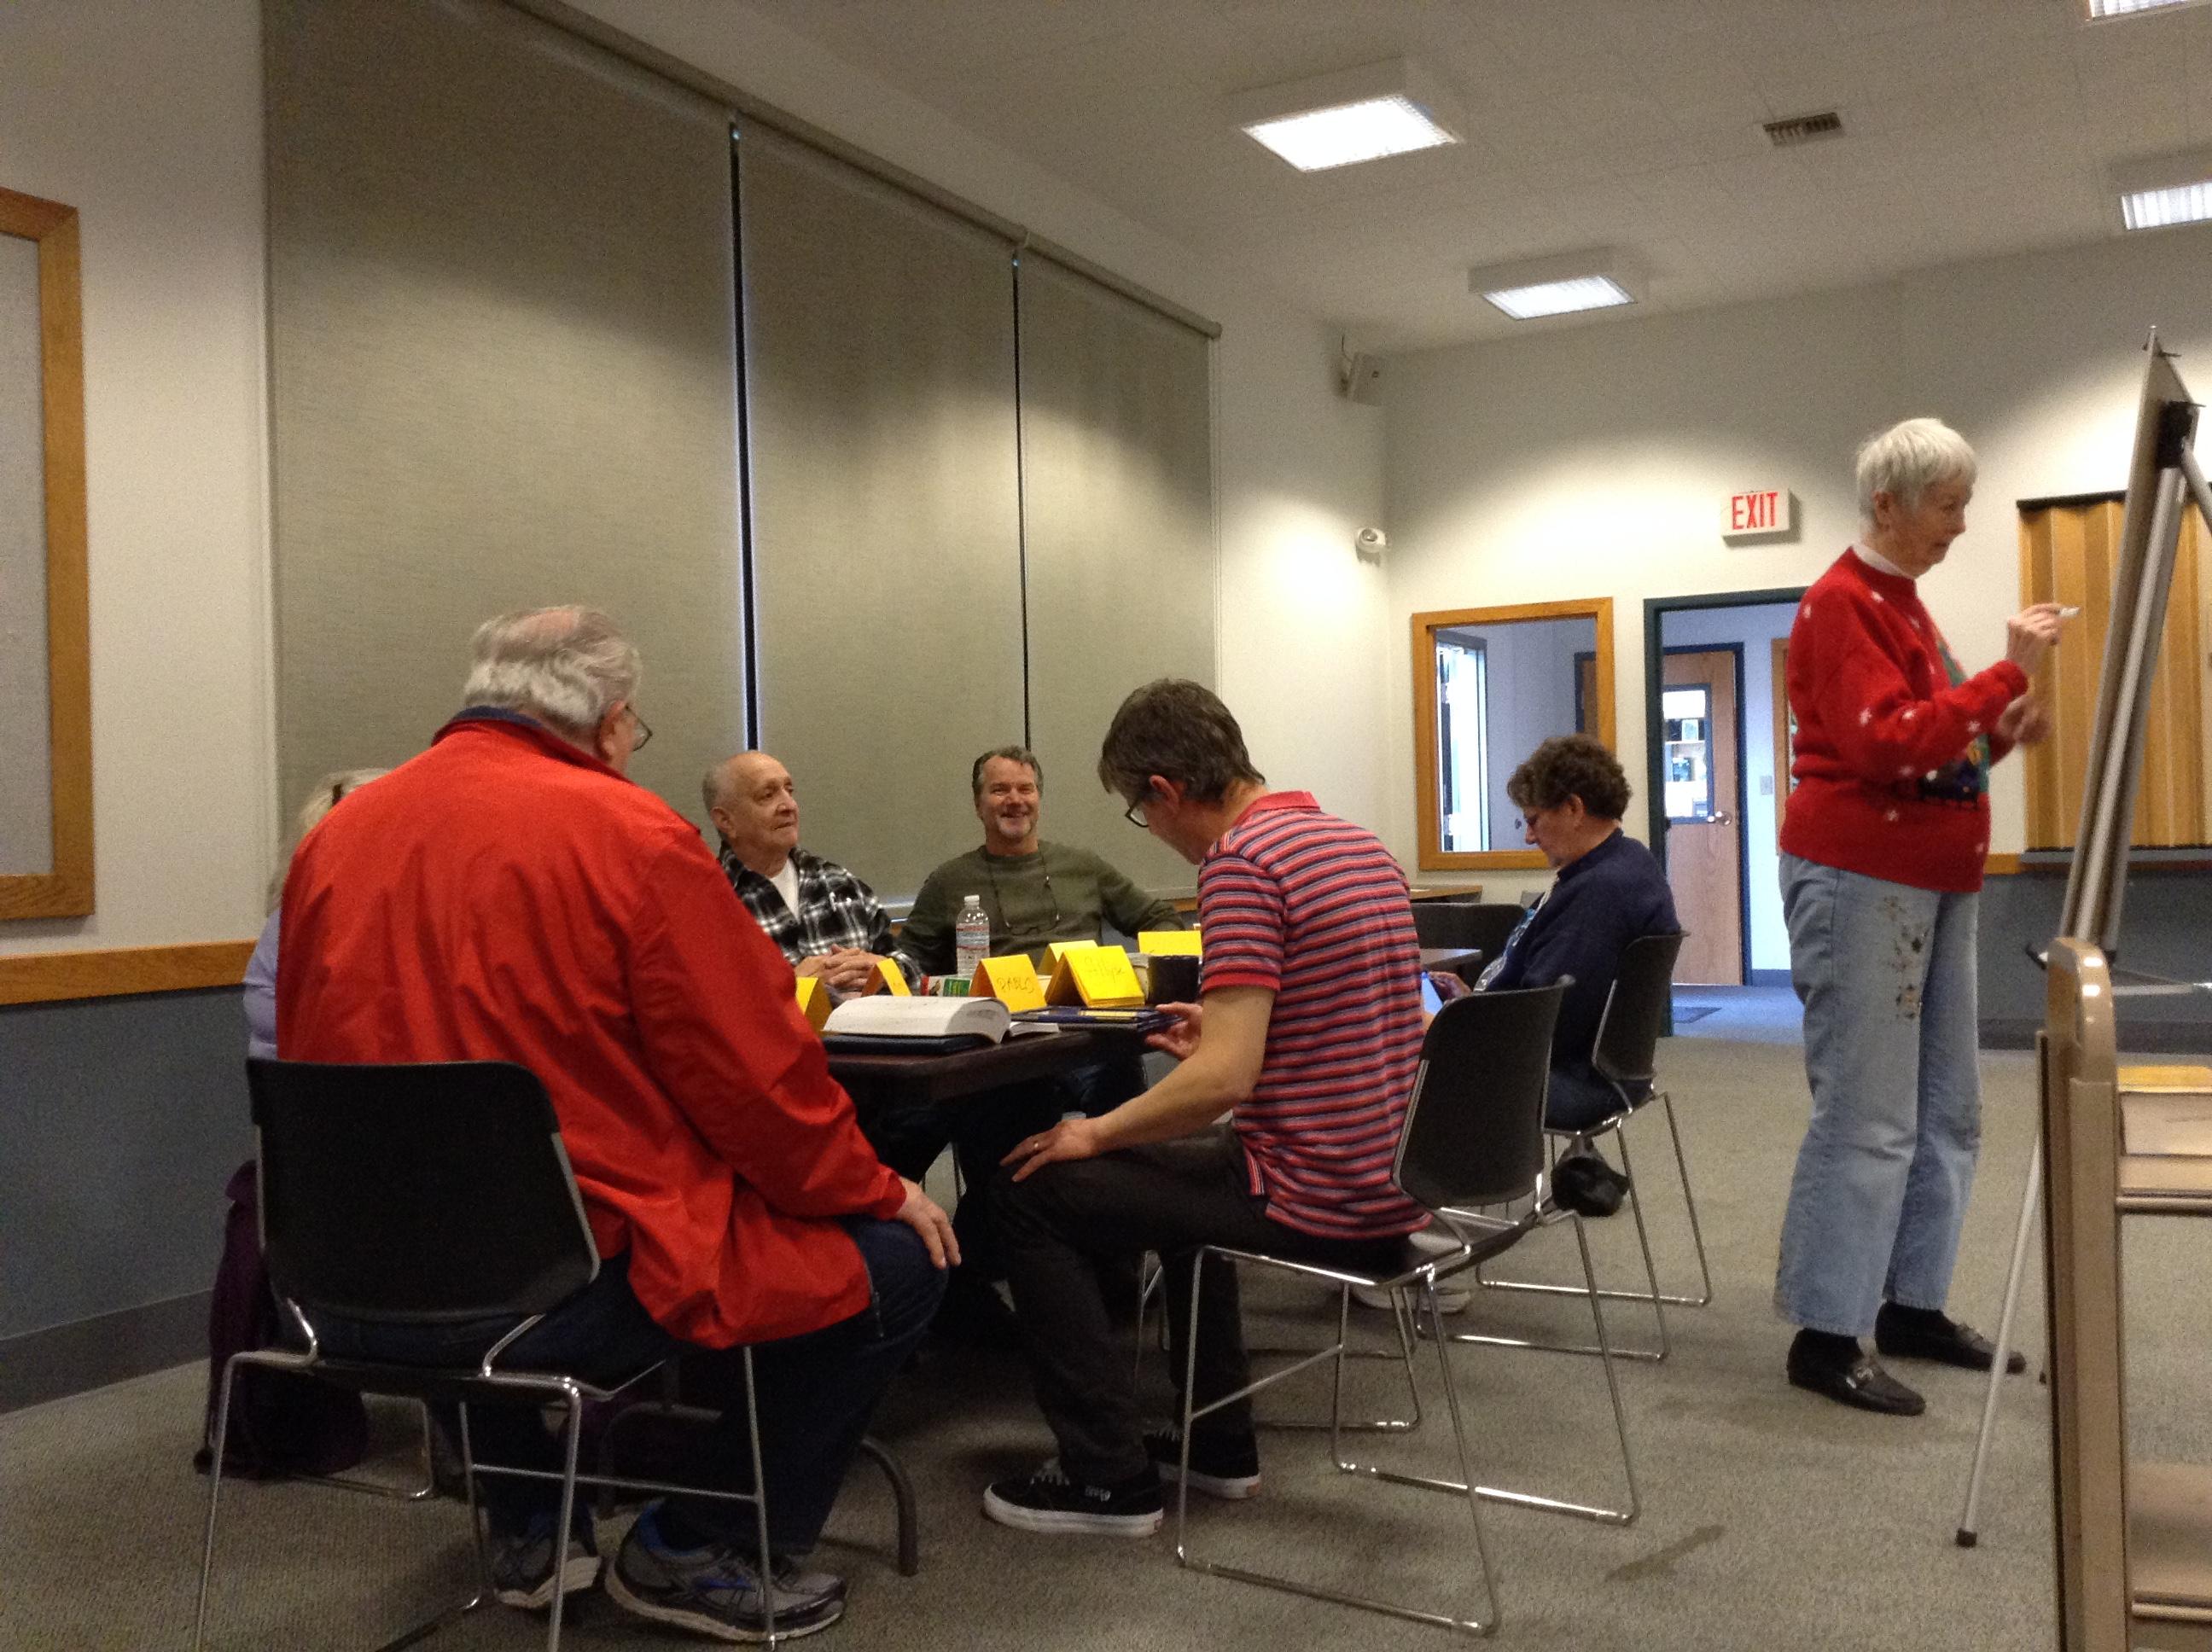 Pic of Spanglish! group conversing